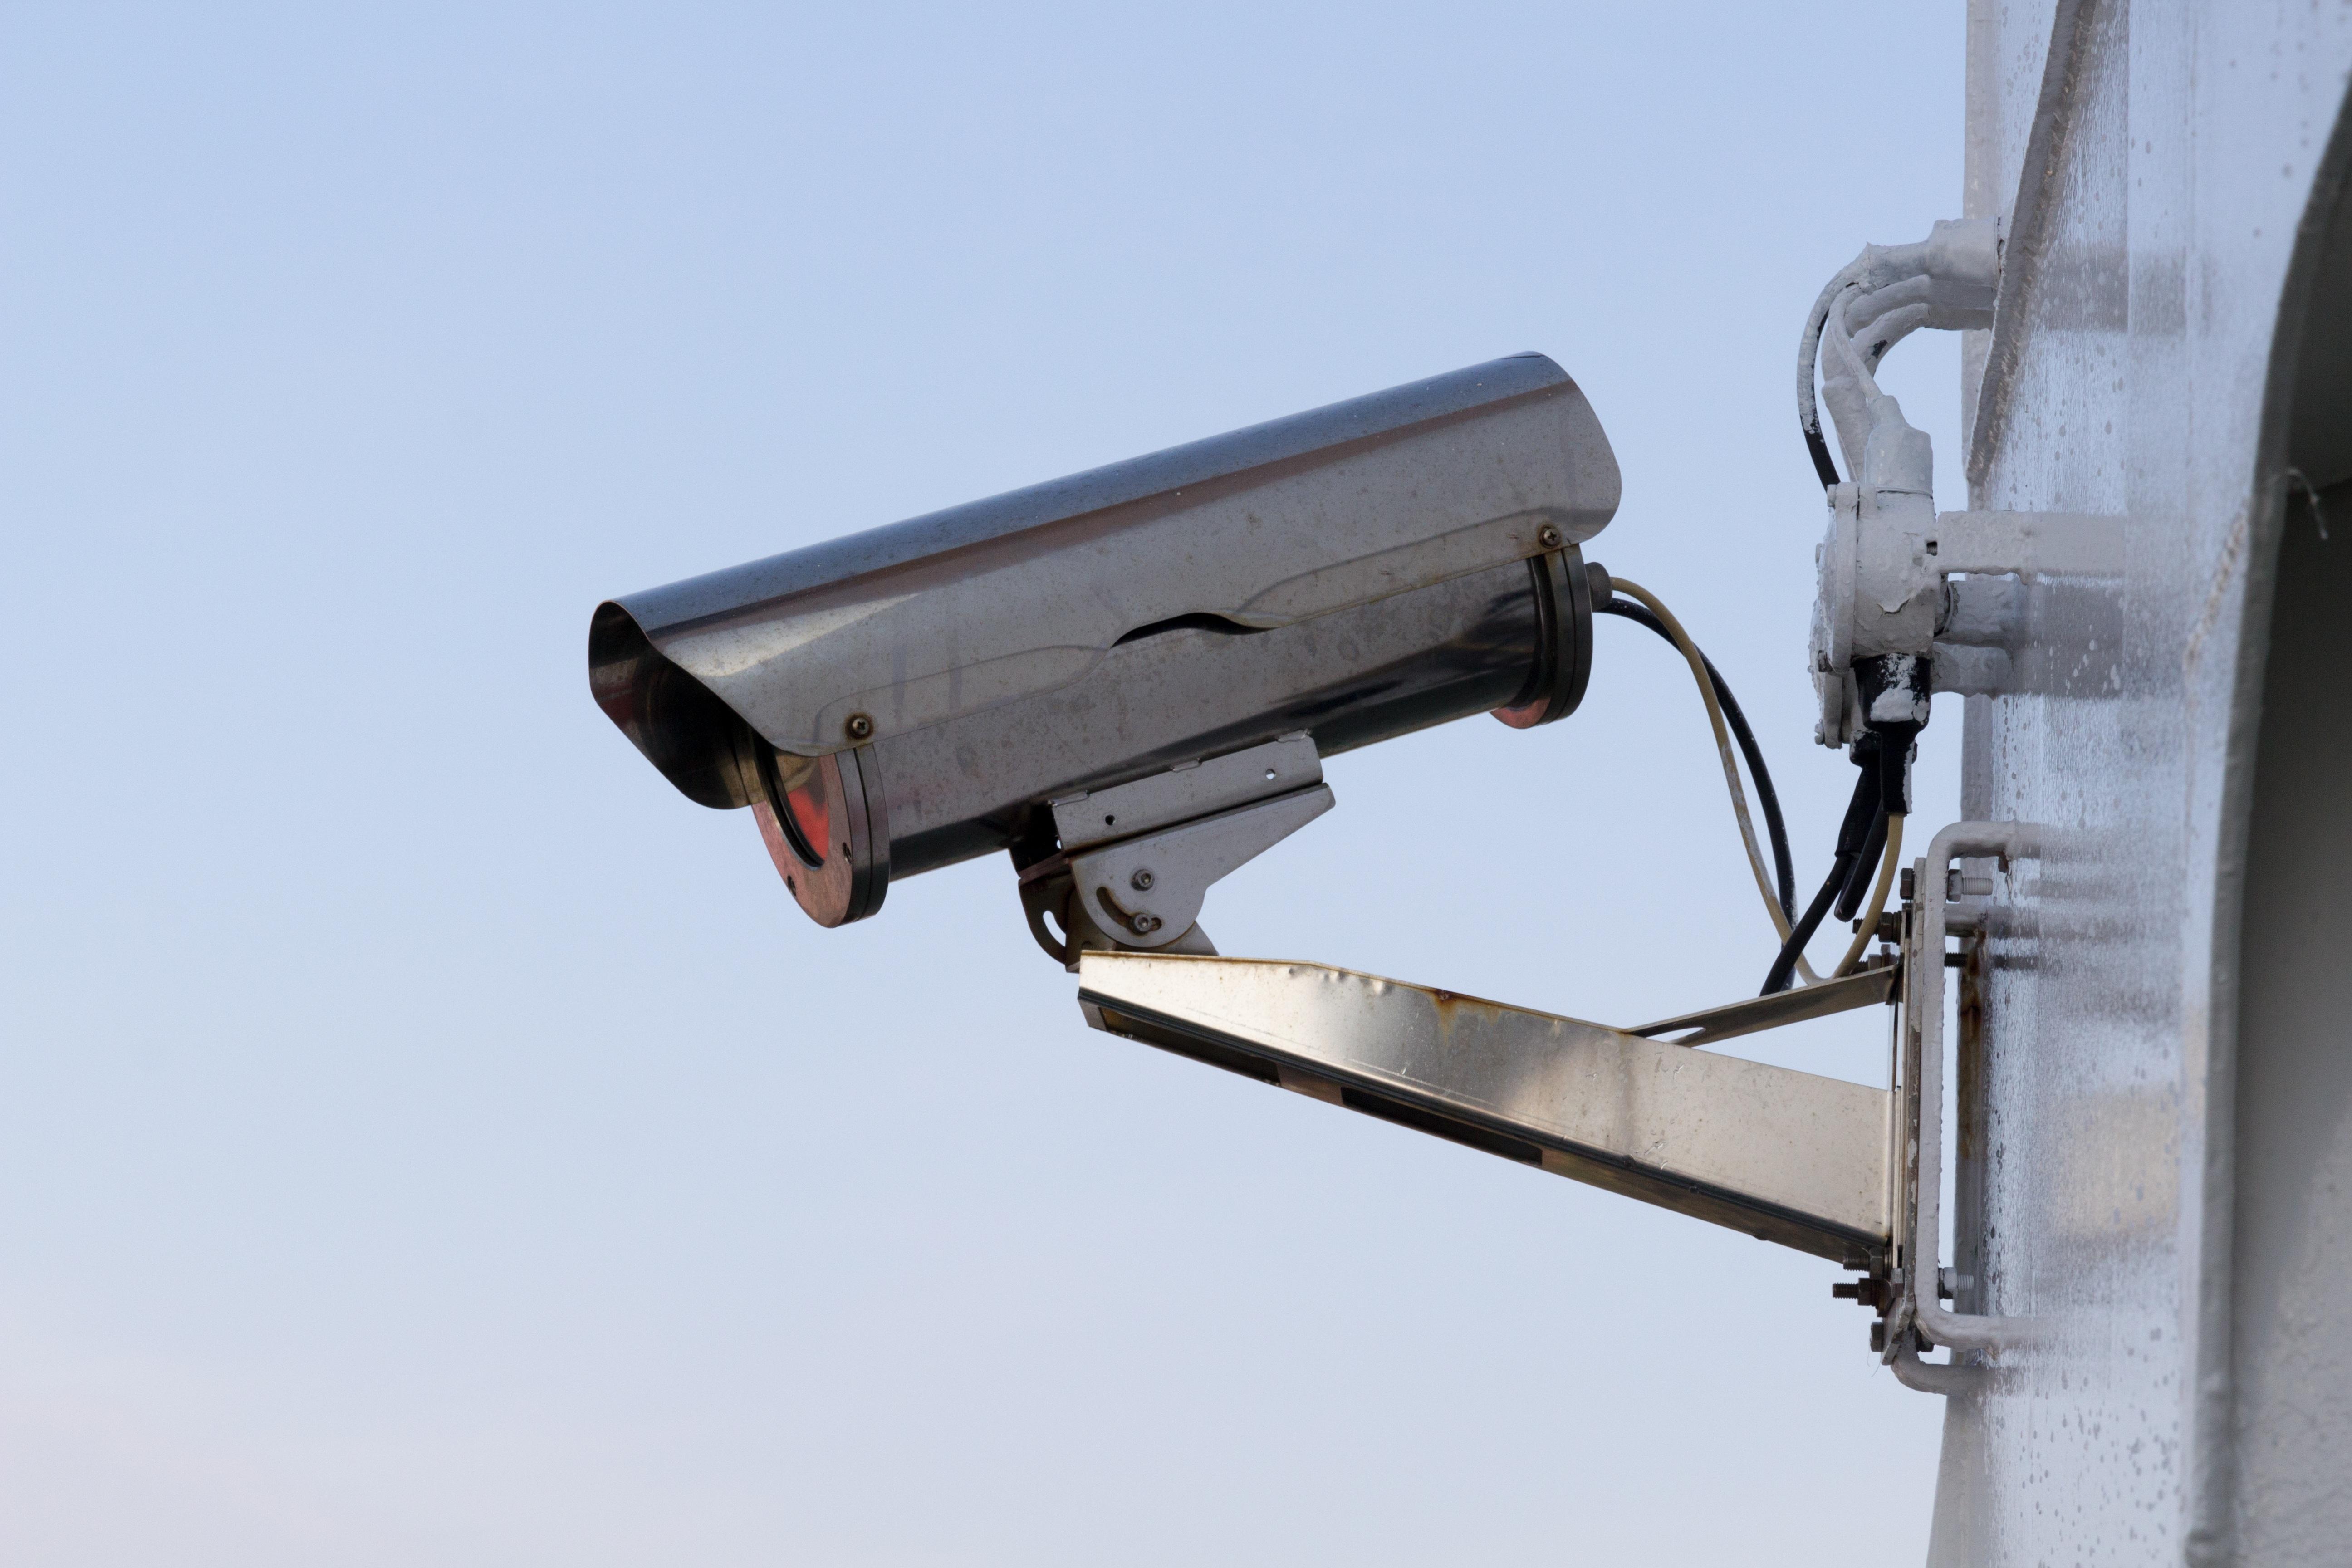 video surveillance through intellicom